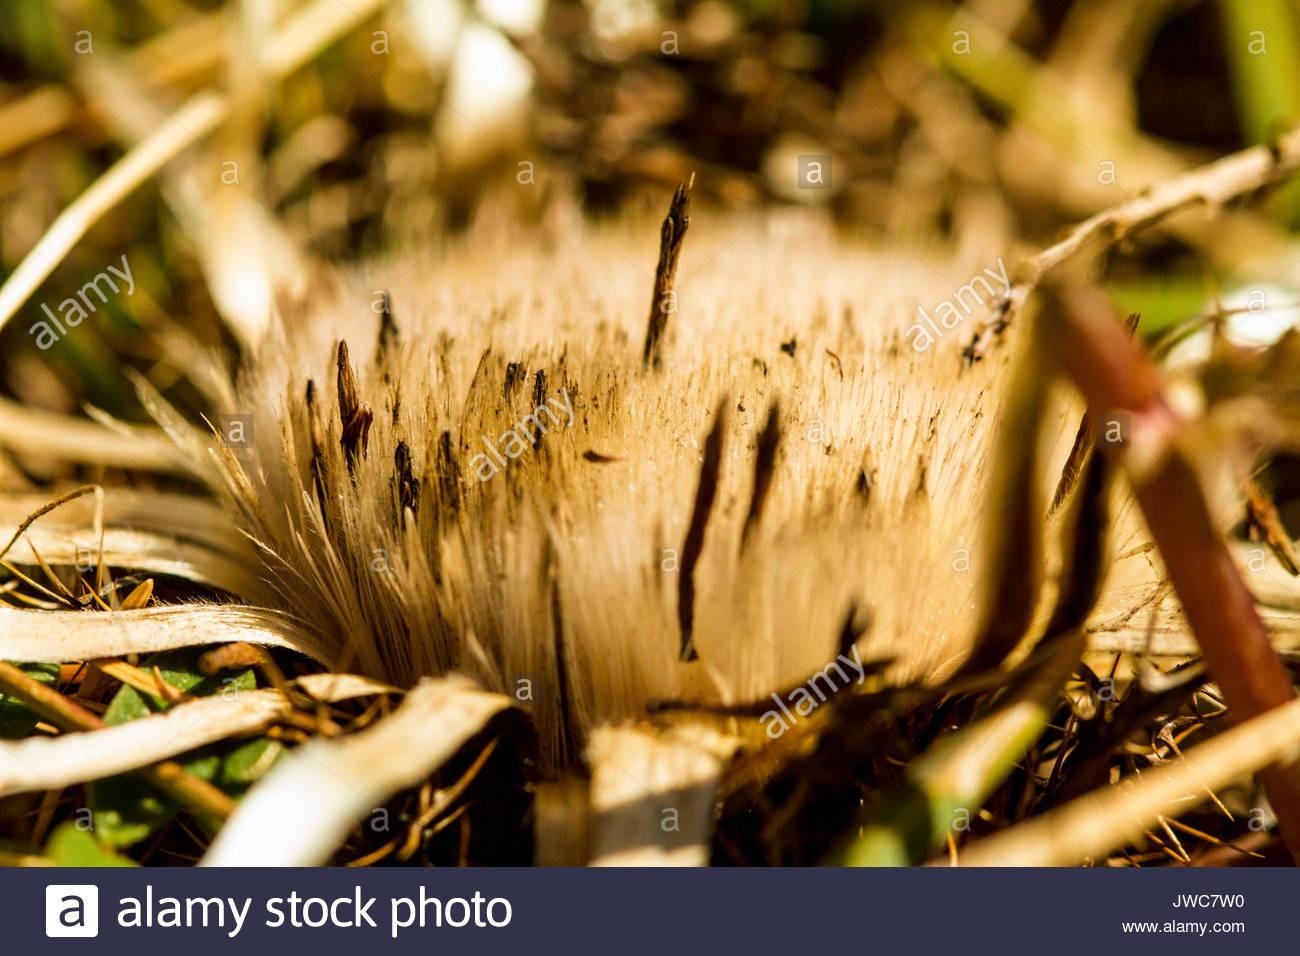 The stemless carline thistle,Carlina acaulis,whose rhizome contains the antibacterial carina oxide. - Stock Image